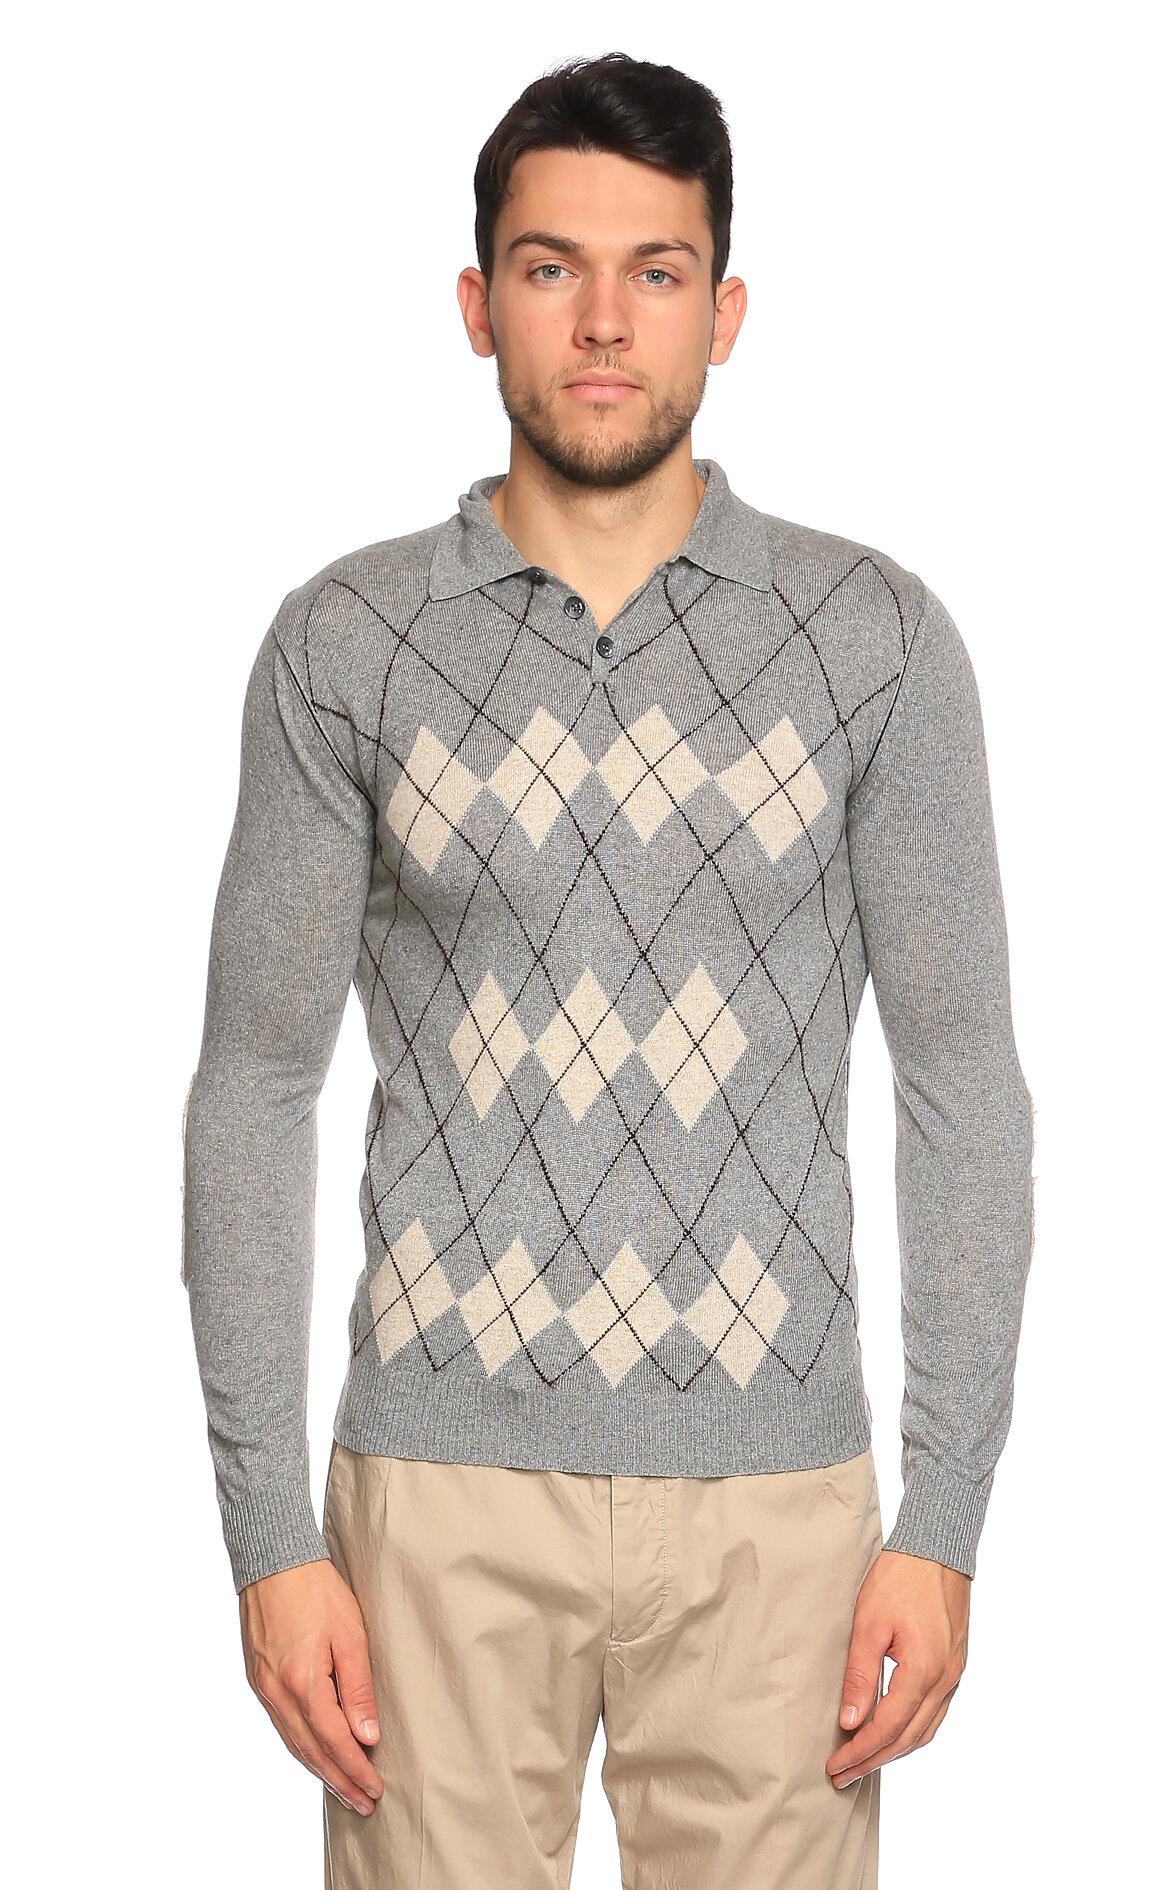 Just Cavalli-Just Cavalli Baklava Desen Uzun Kollu Gri Polo T-Shirt